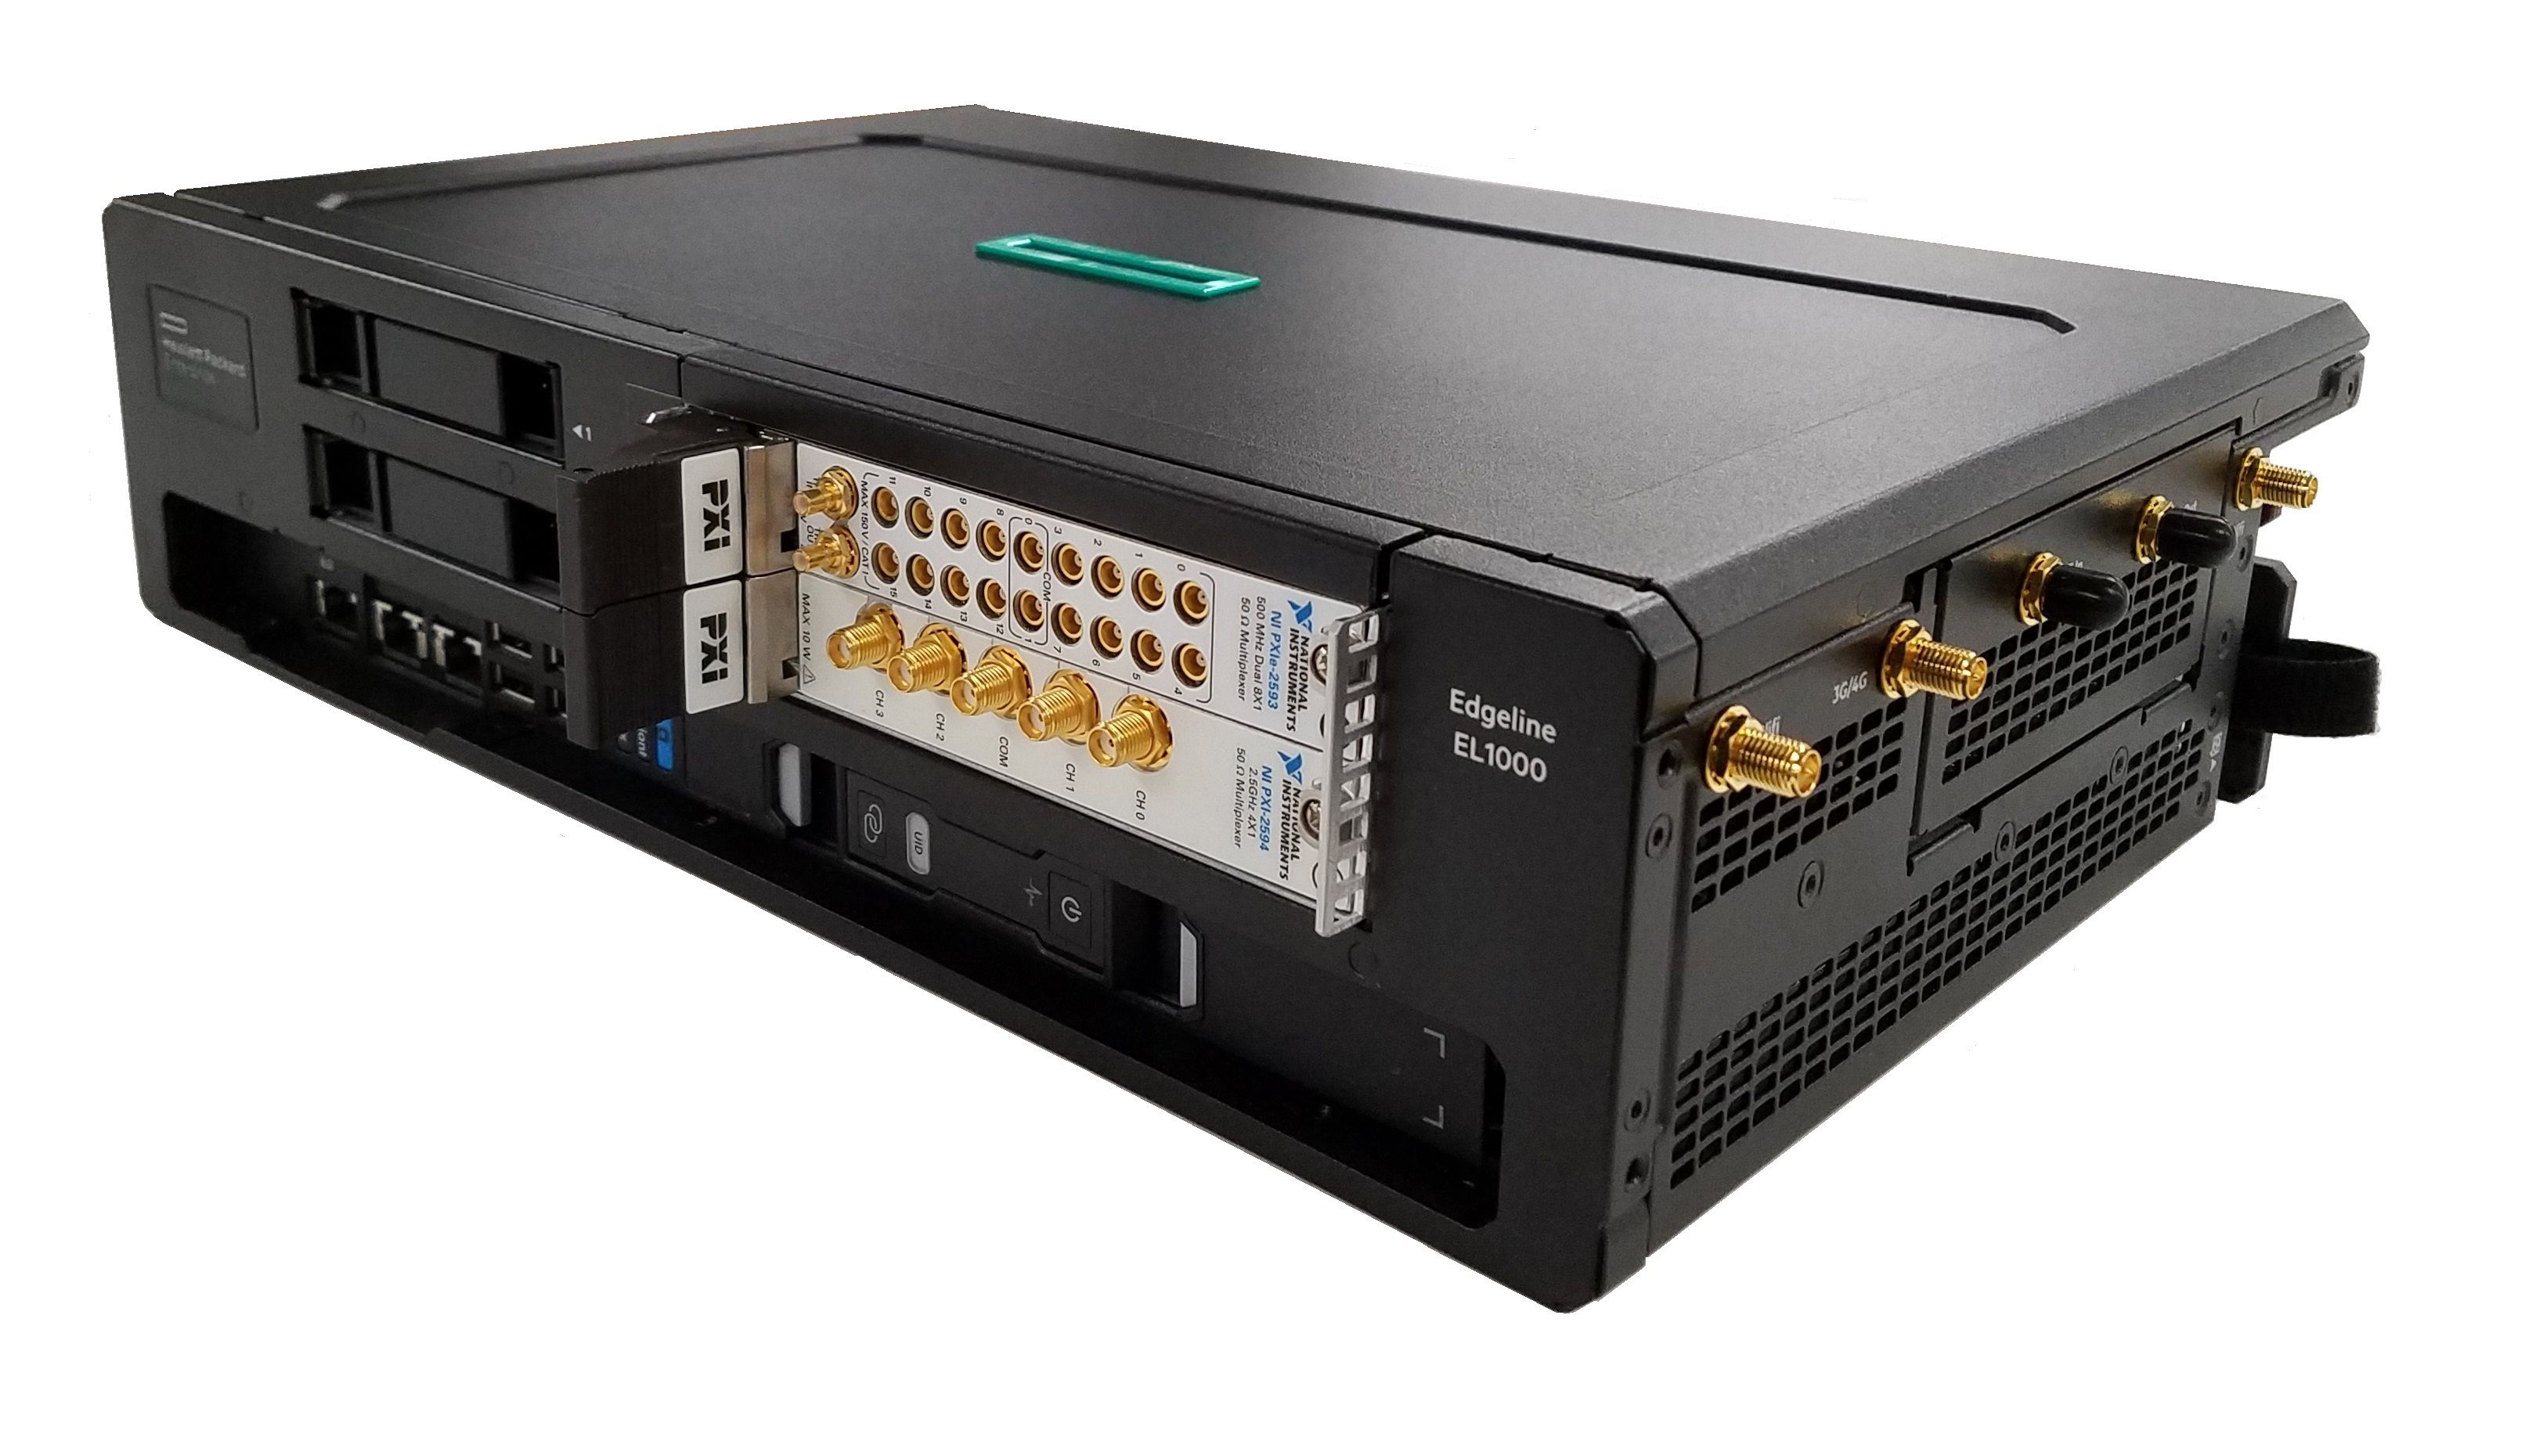 HPE Edgeline Converged Edge System EL 1000.jpg